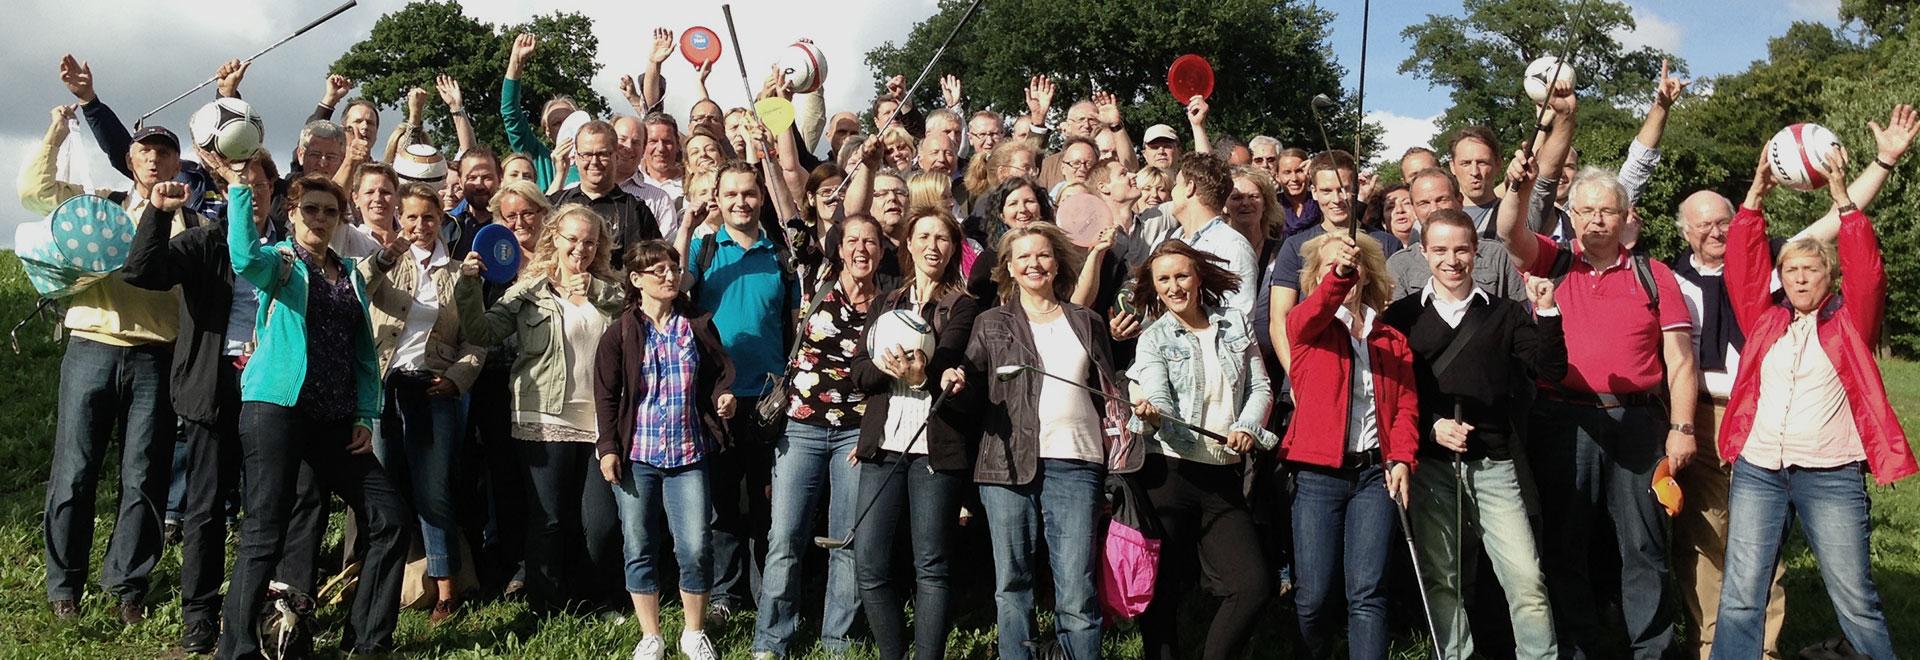 Urban Golf Klein Flottpark in Hamburg HeldenAusflug